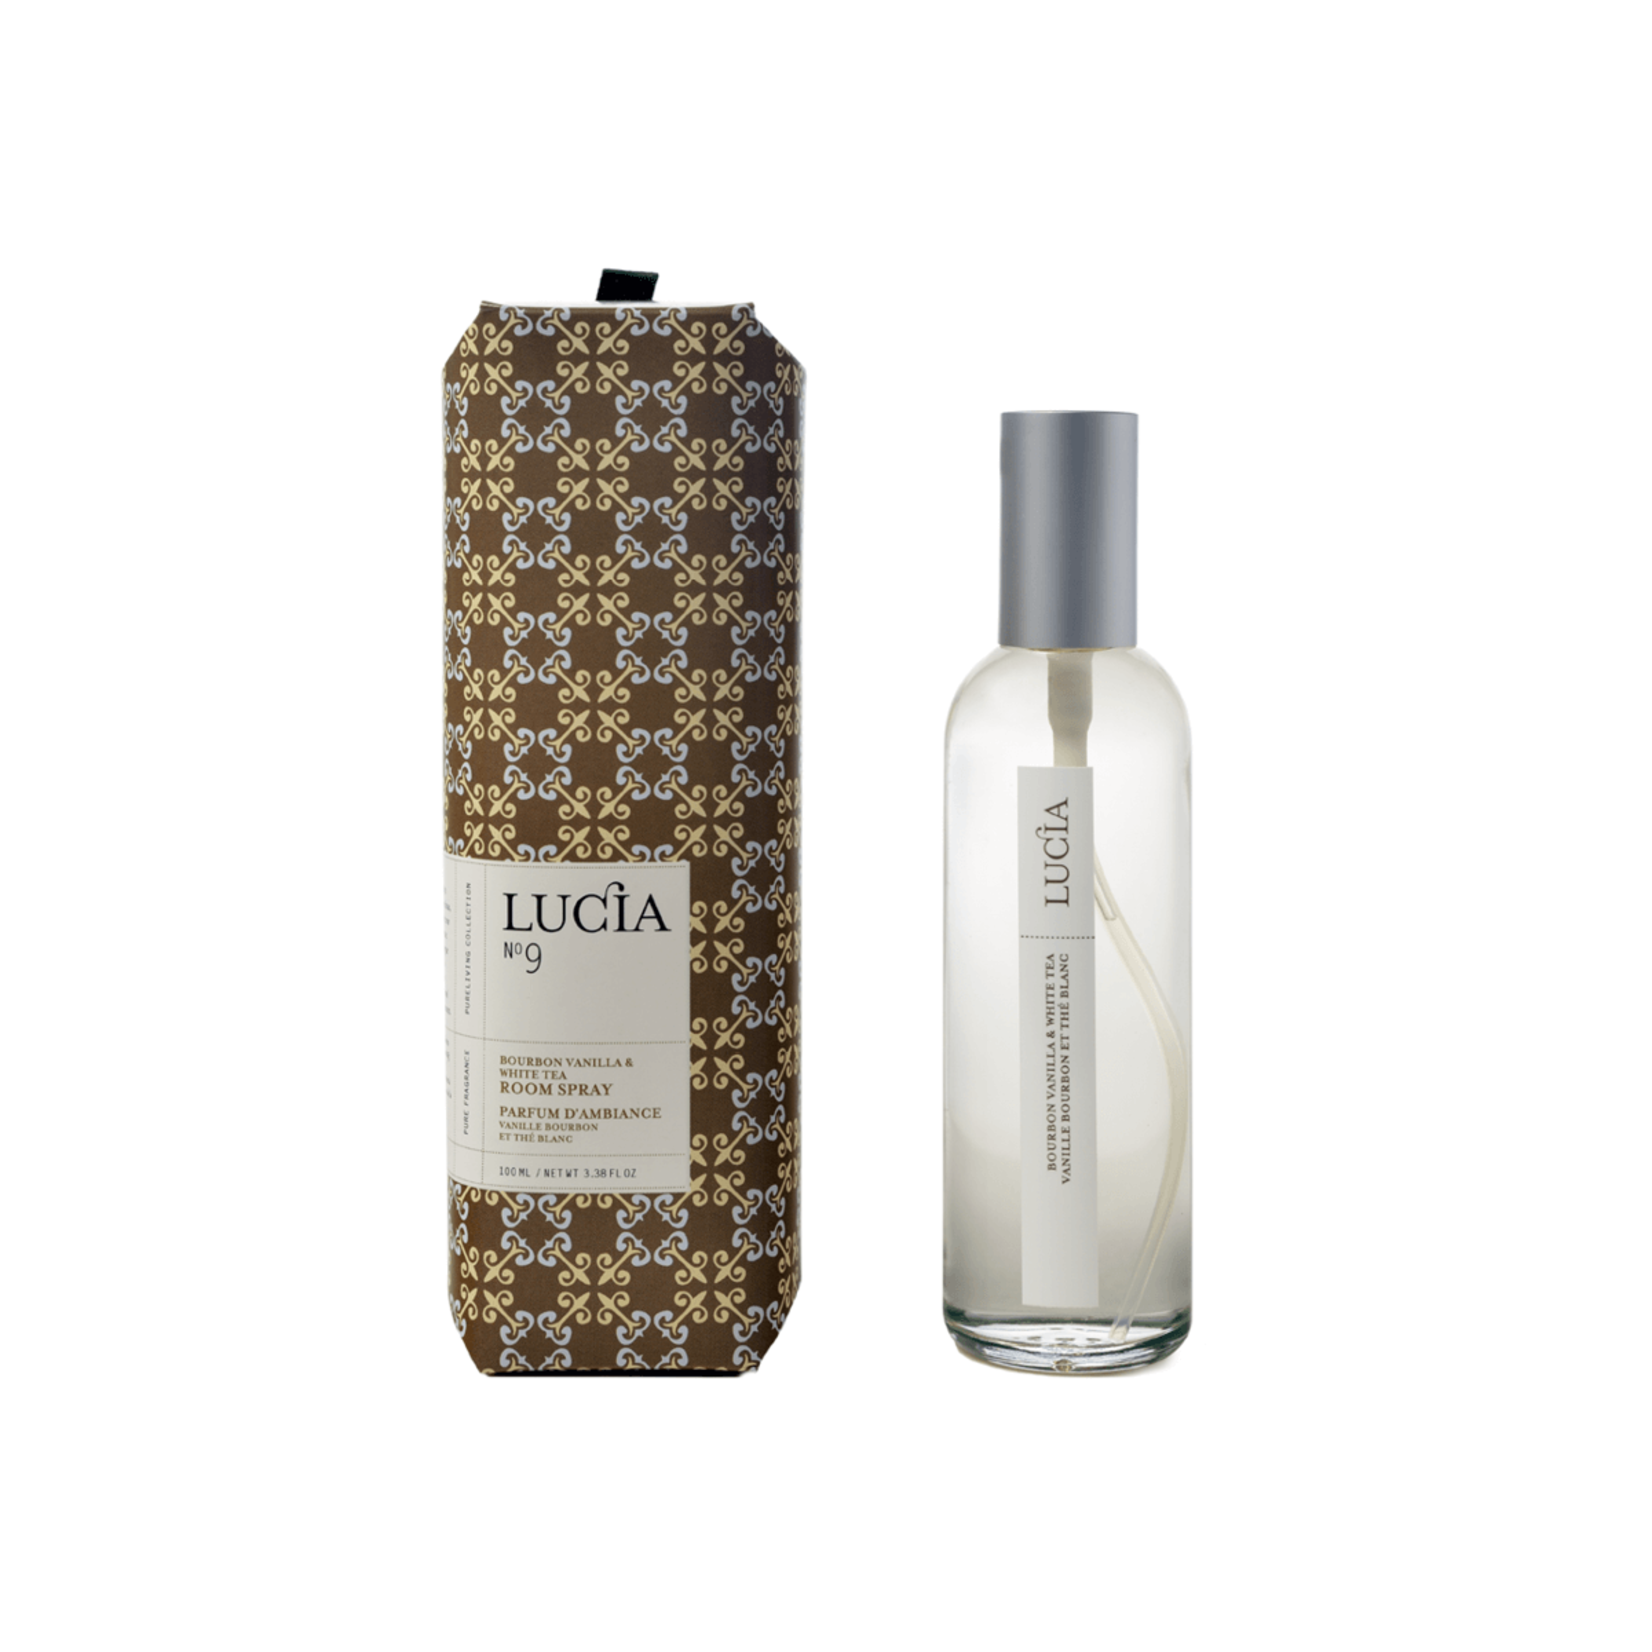 Lucia LUCIA no9 - Parfum d'ambiance